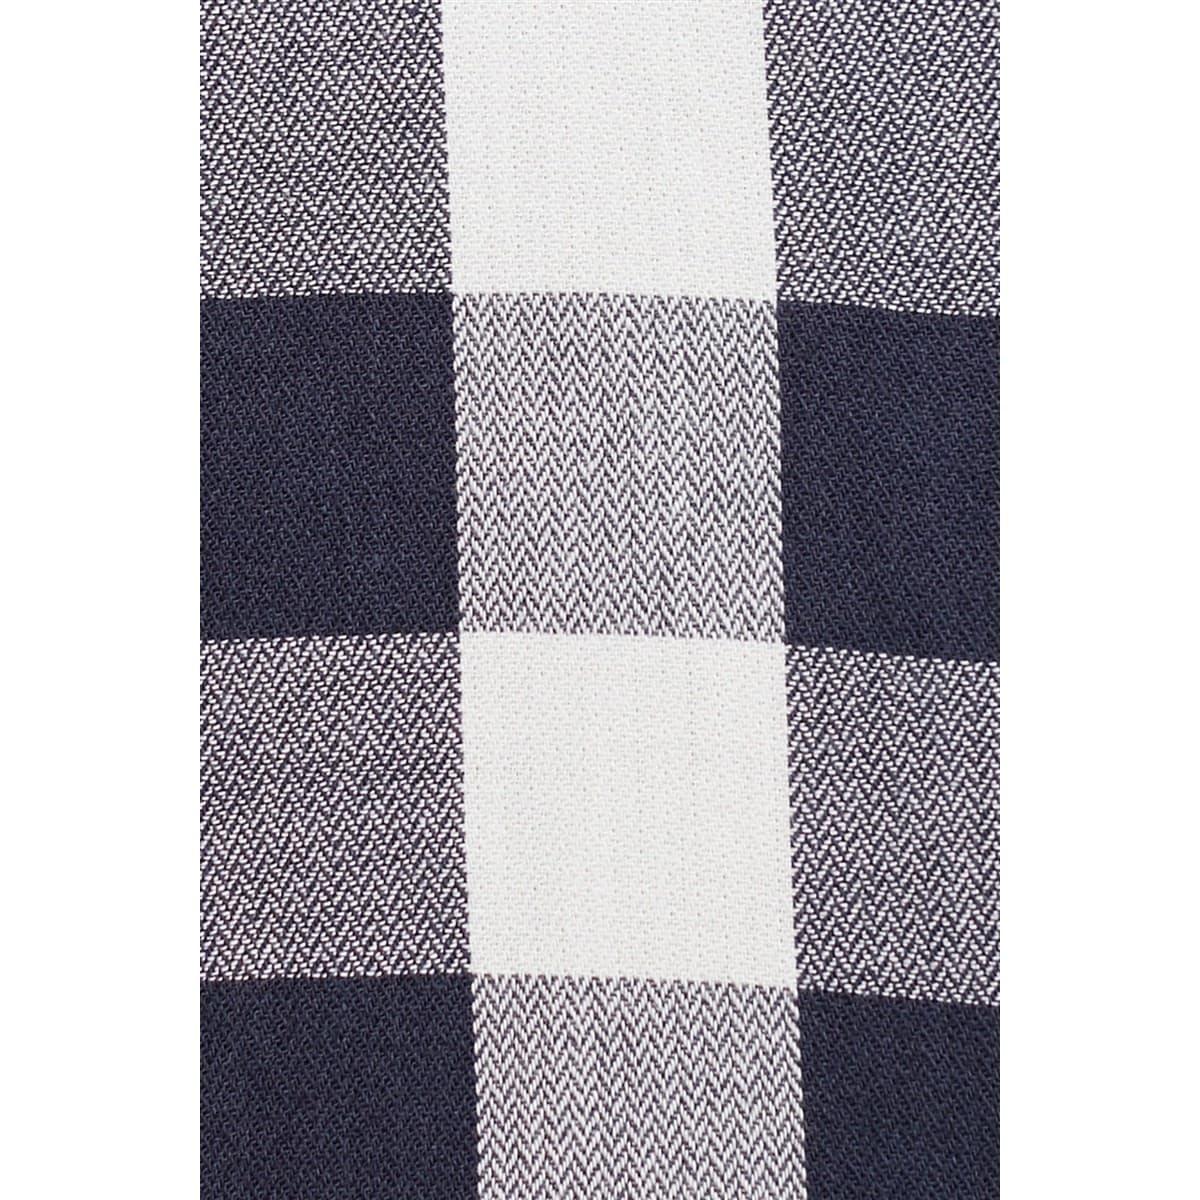 V Yaka Elbise Derin Mavi Kareli